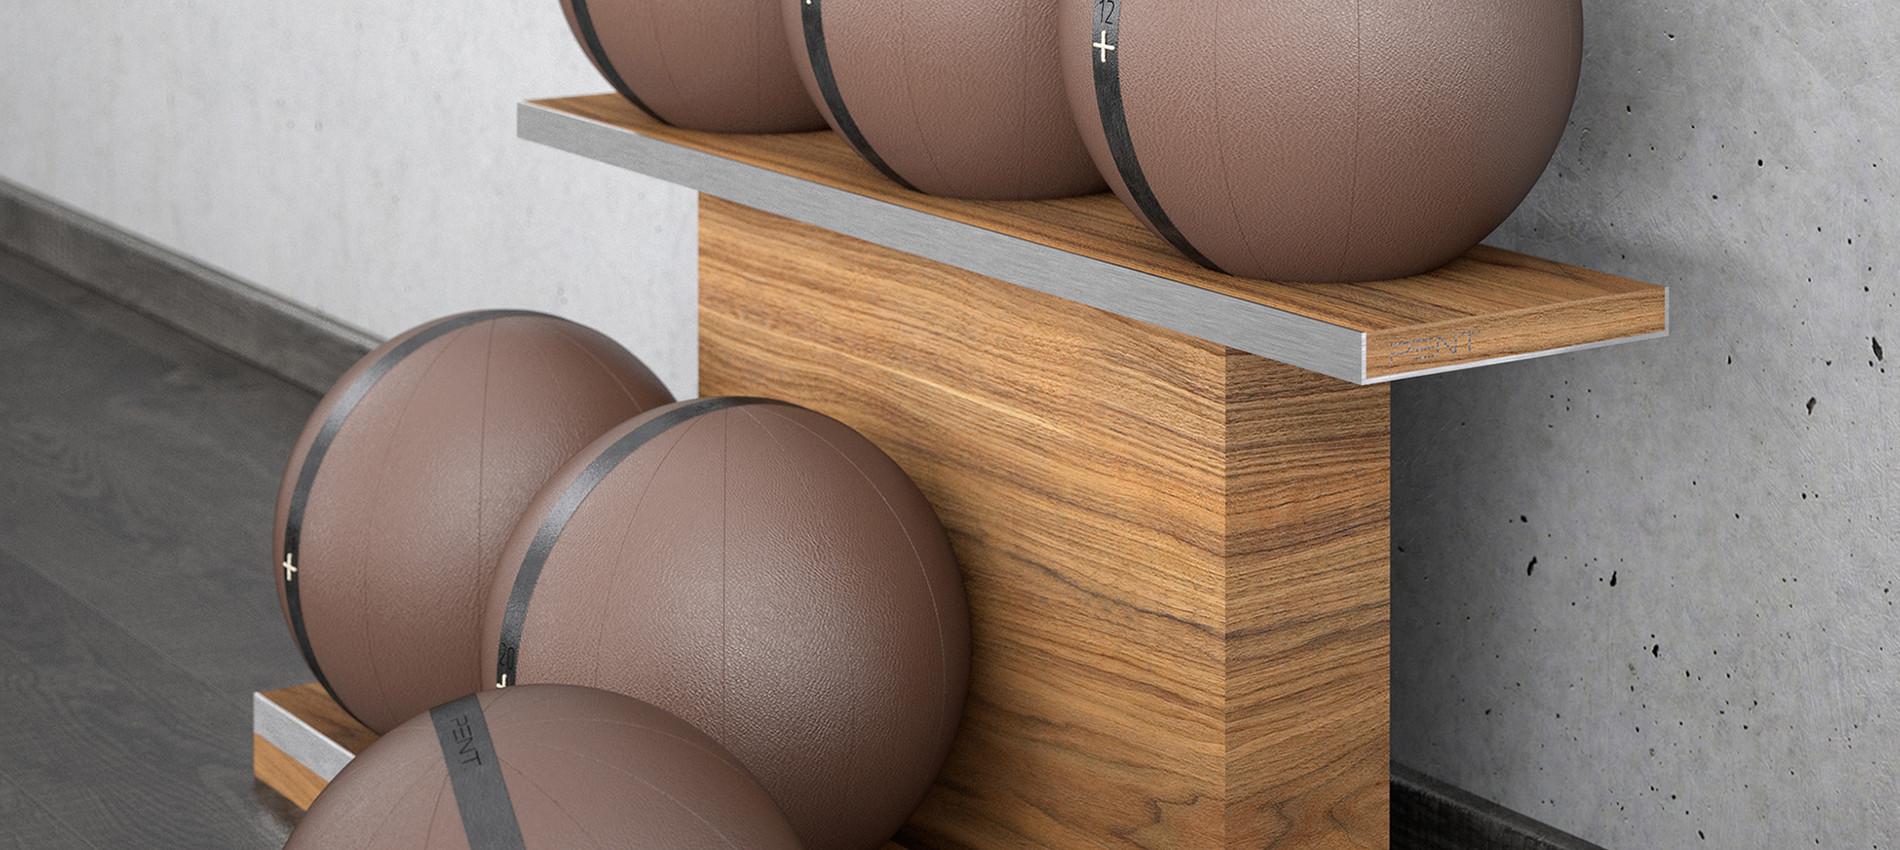 MOXA Luxury Home Gym Equipment